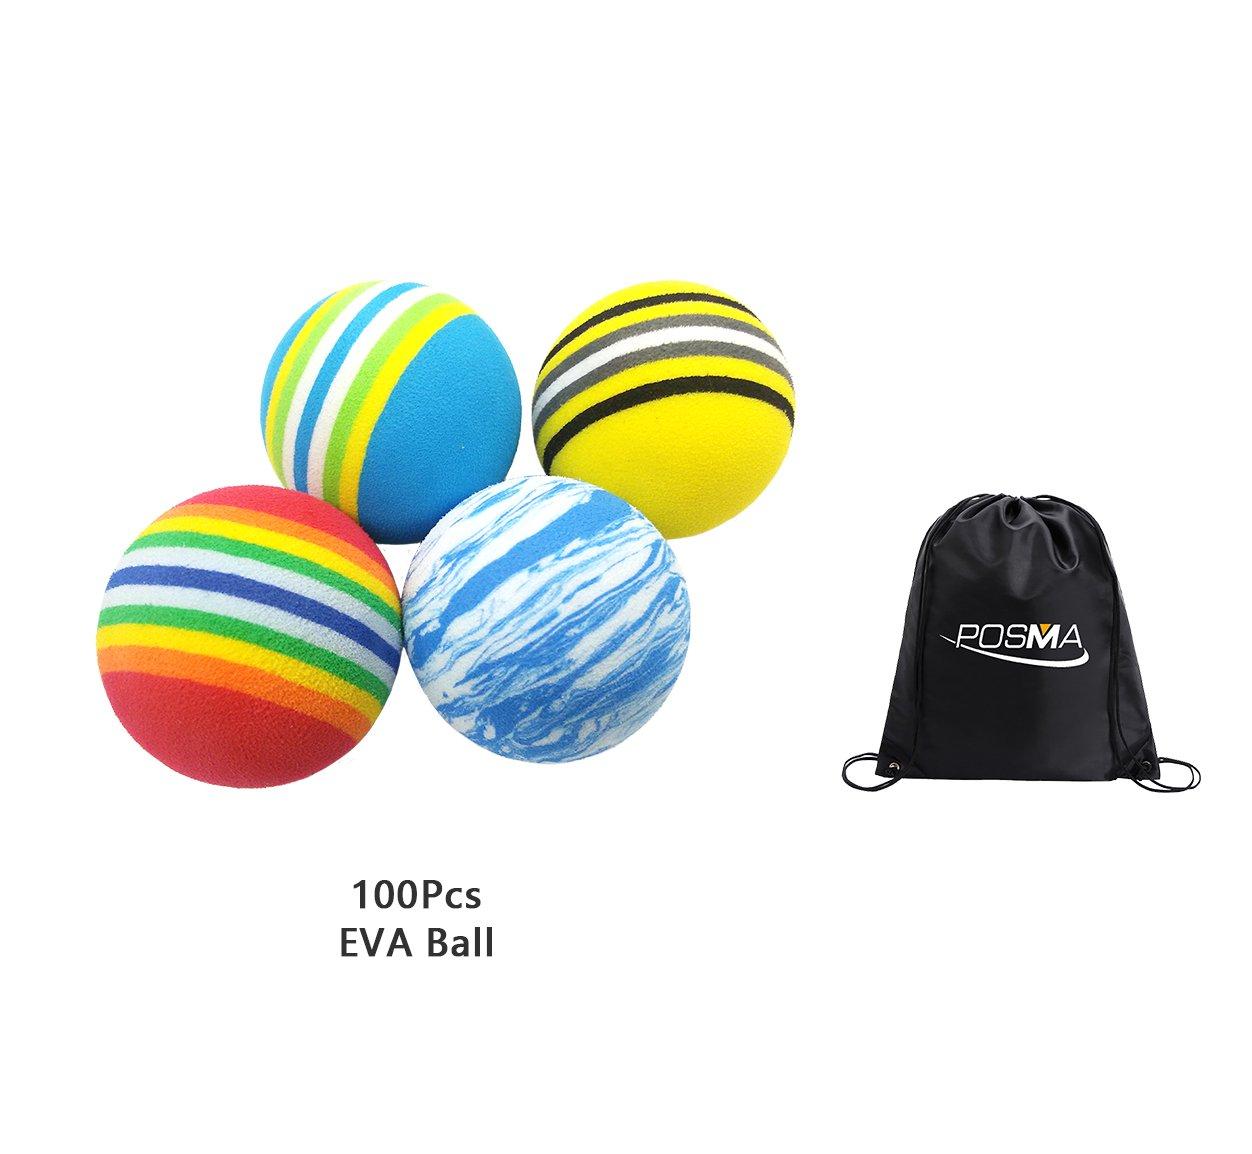 POSMA EB010 Multi Color Golf Foam Practice Balls 100pcs bundle gift set with Cinch Sack Carry Bag- soft elastic golf balls golf training